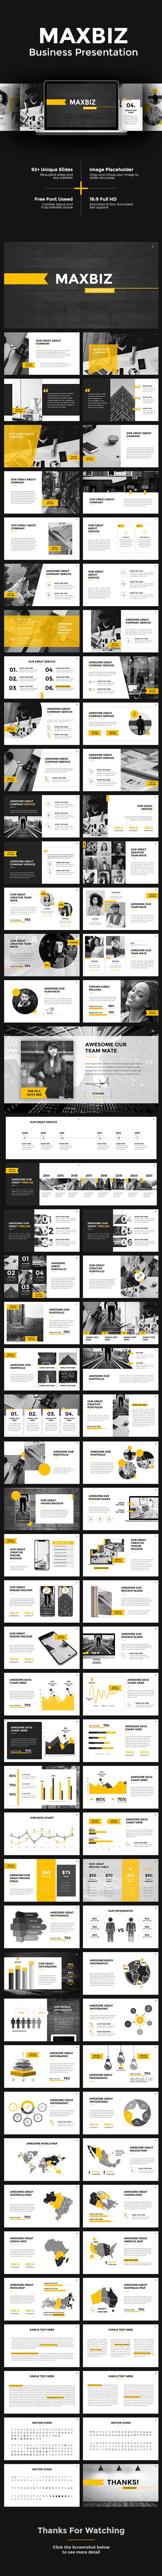 Maxbiz - Business PowerPoint - Business PowerPoint Templates